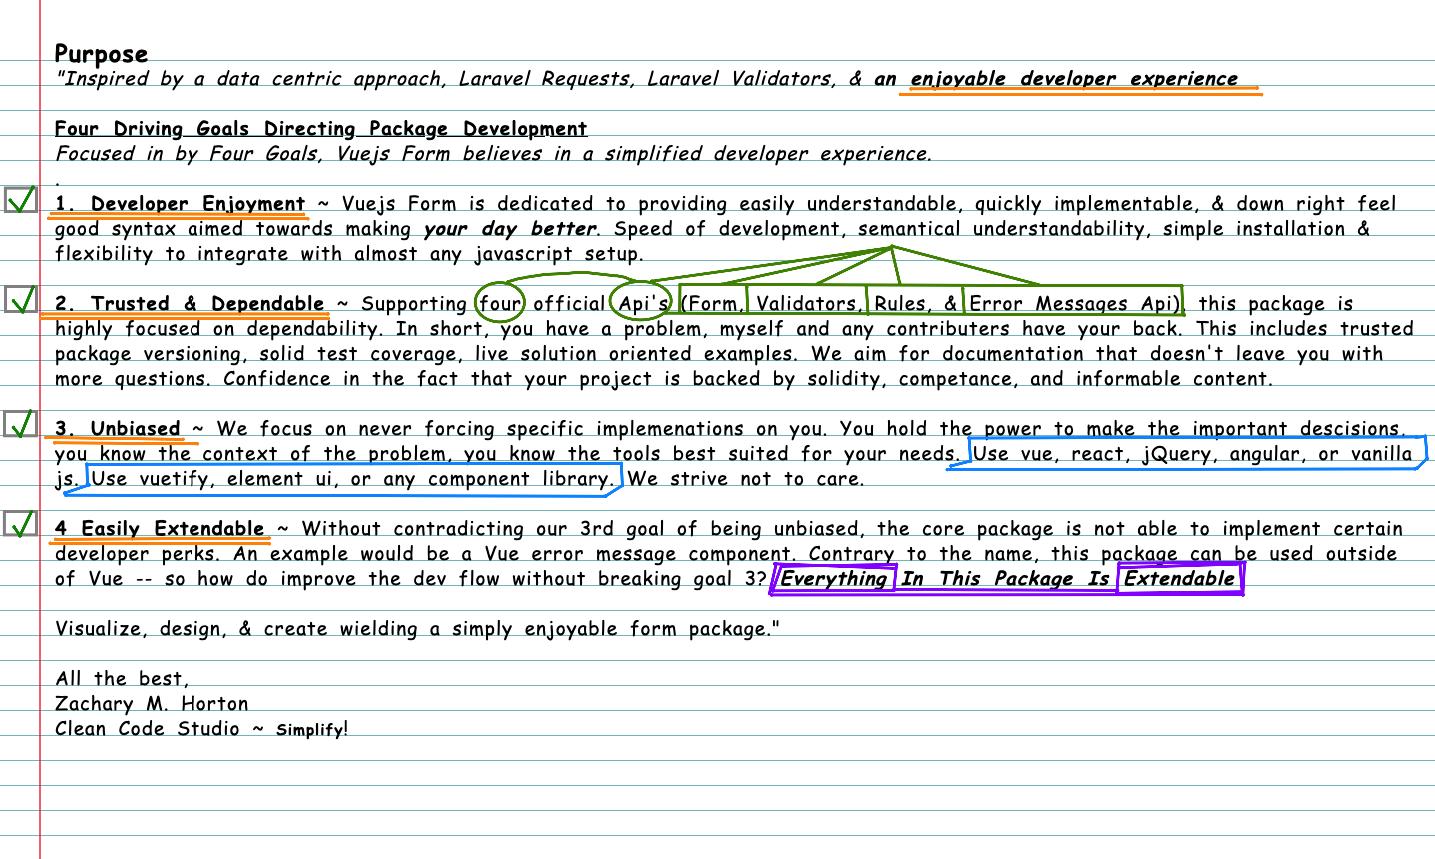 Vue Form AKA Vuejs Form Mission Statement For Building Vue Validation & Javascript Validated Forms